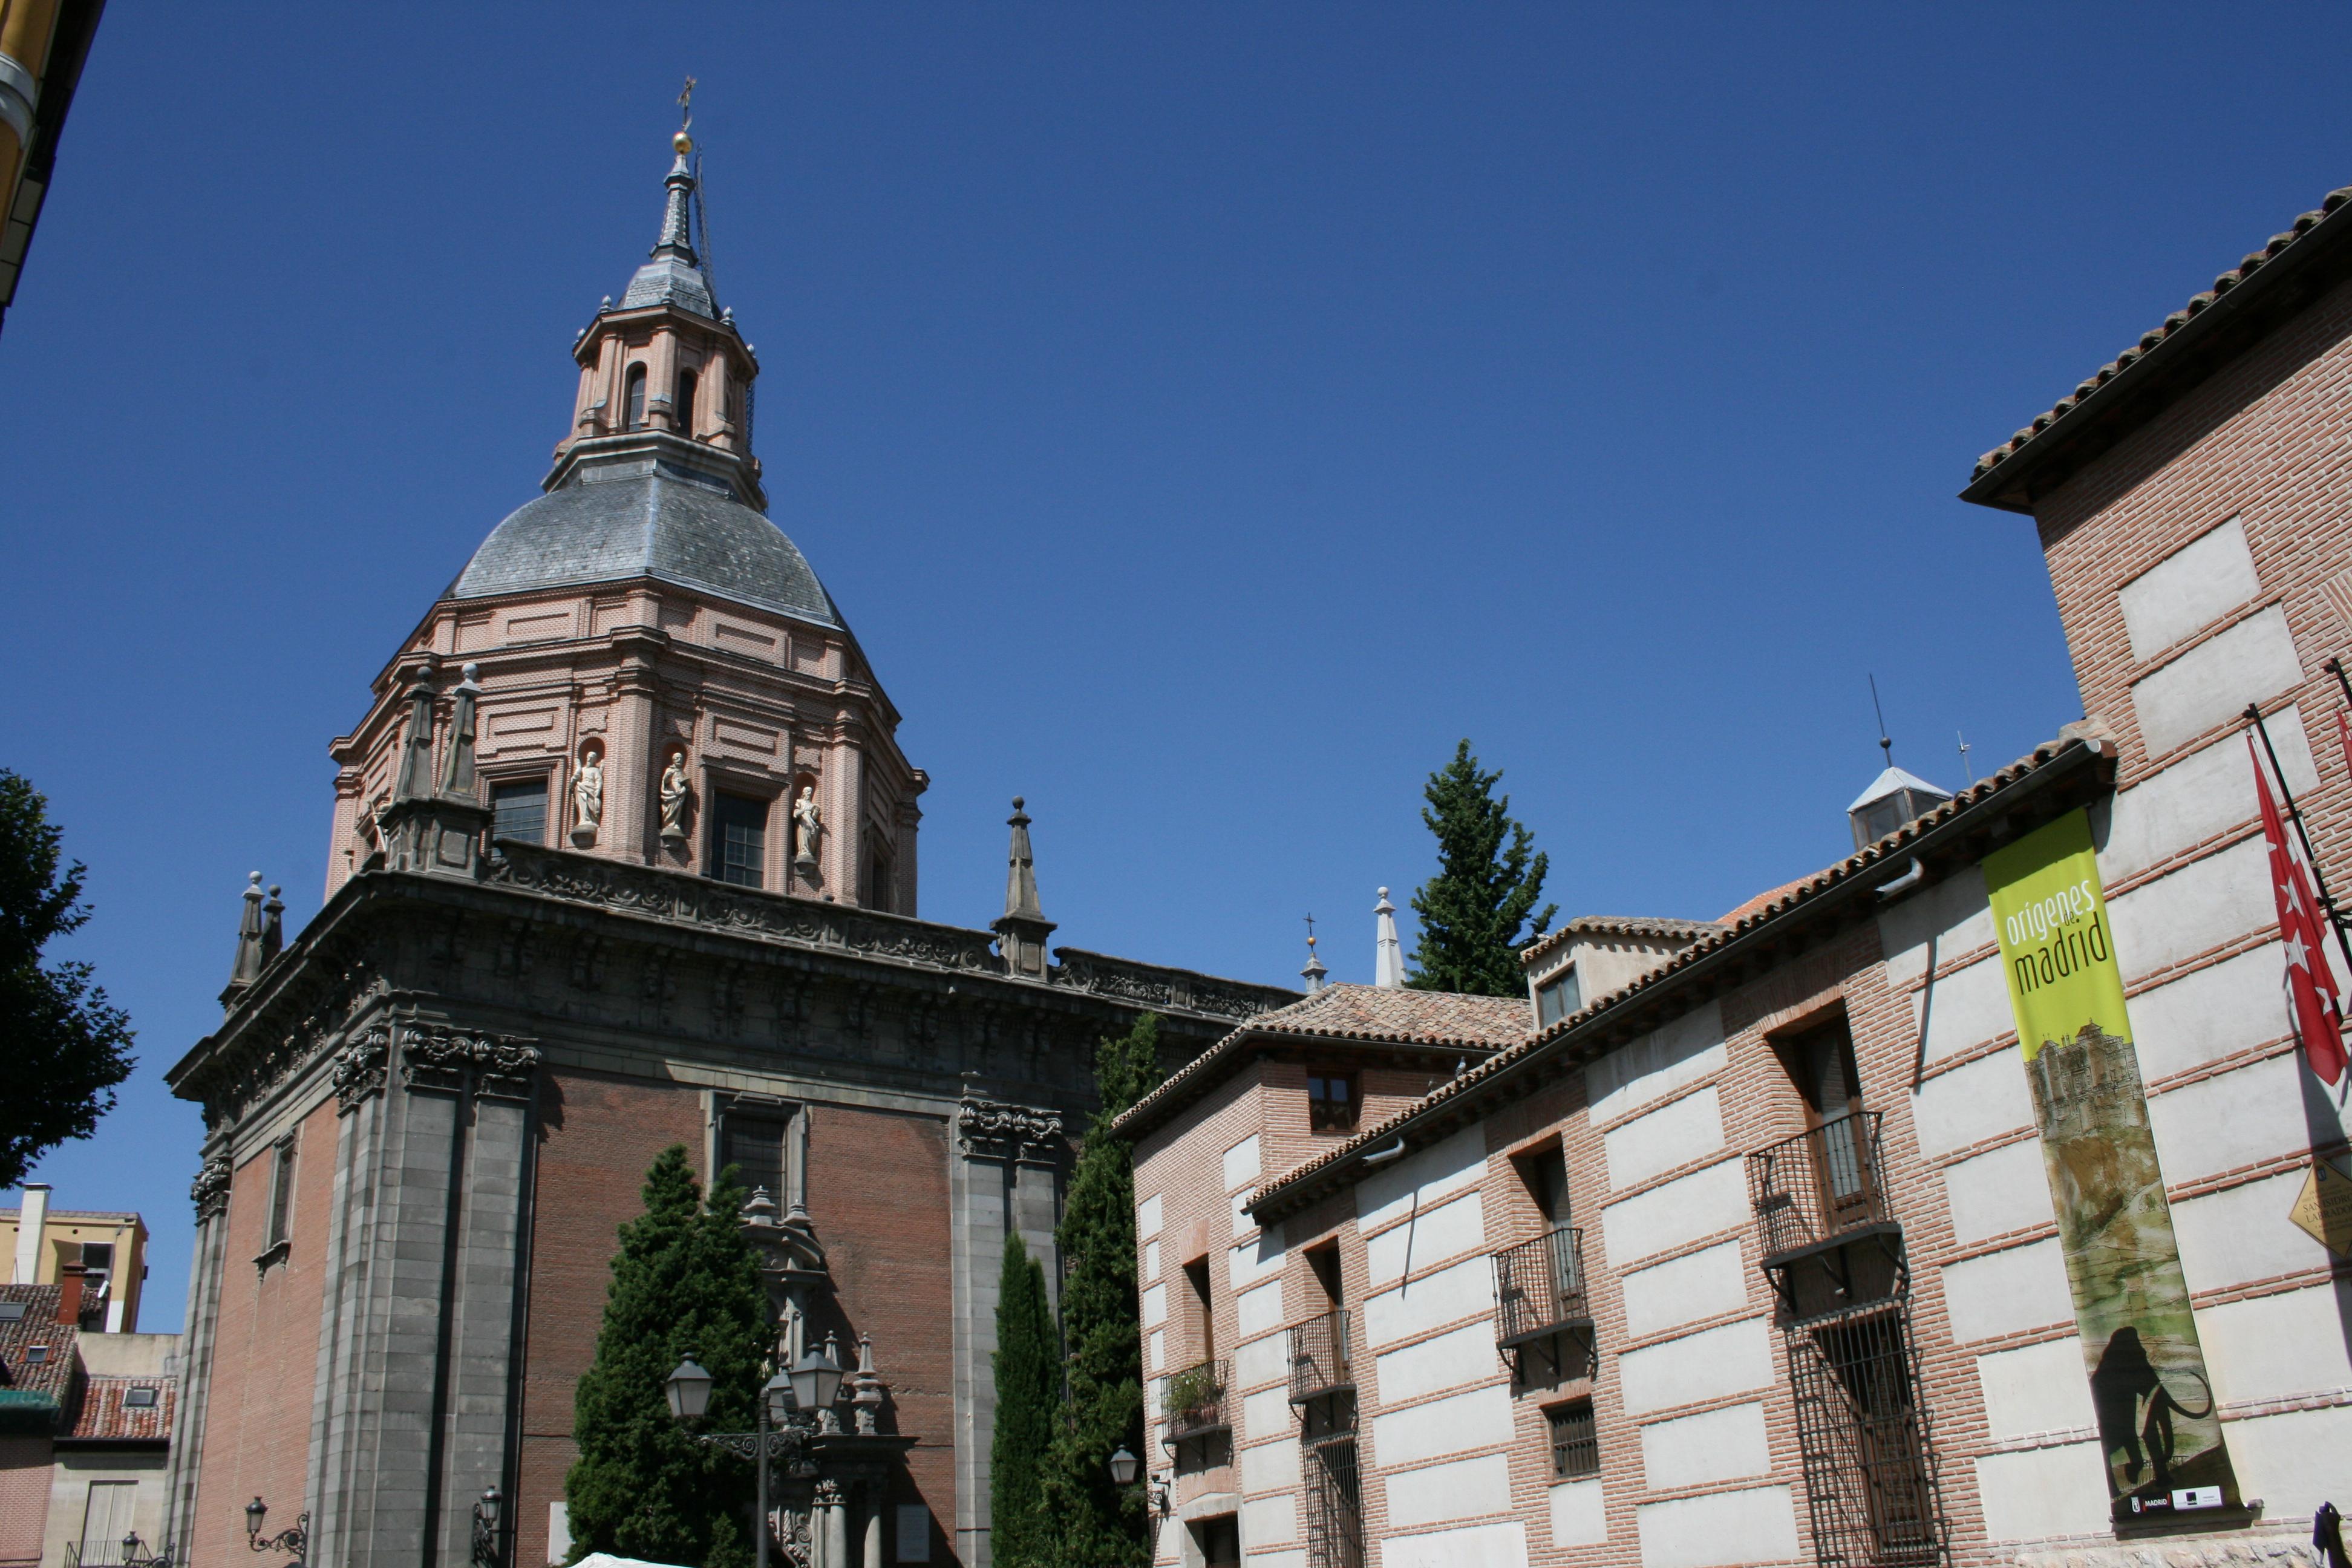 File:Iglesia de San Andrés, Madrid.jpg - Wikimedia Commons